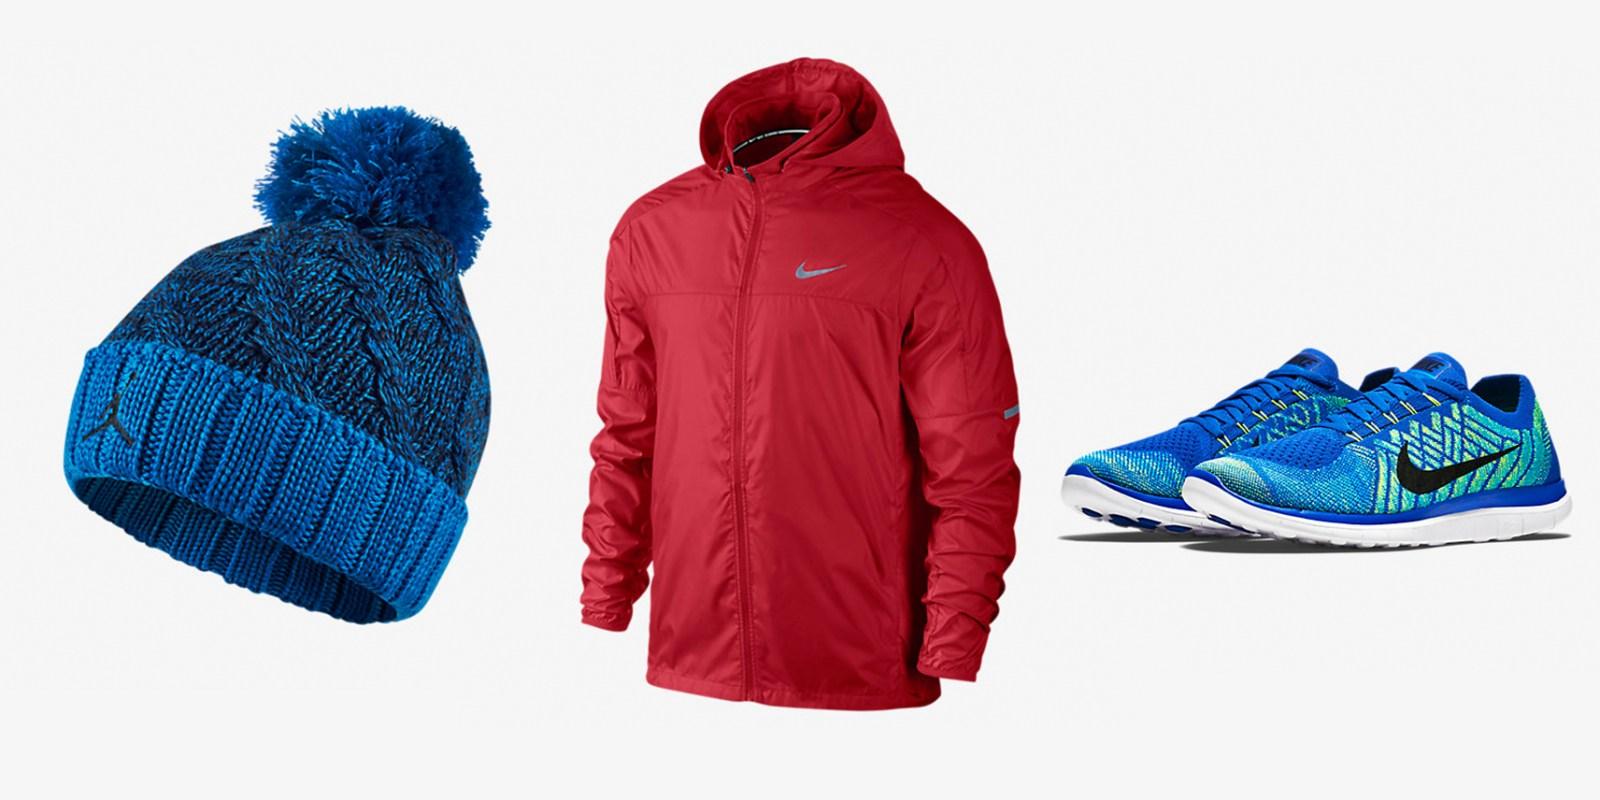 Fashion: Nike extra 25% off clearance – Vapor Jacket $82 (Orig. $130), PUMA up to 70% off, more